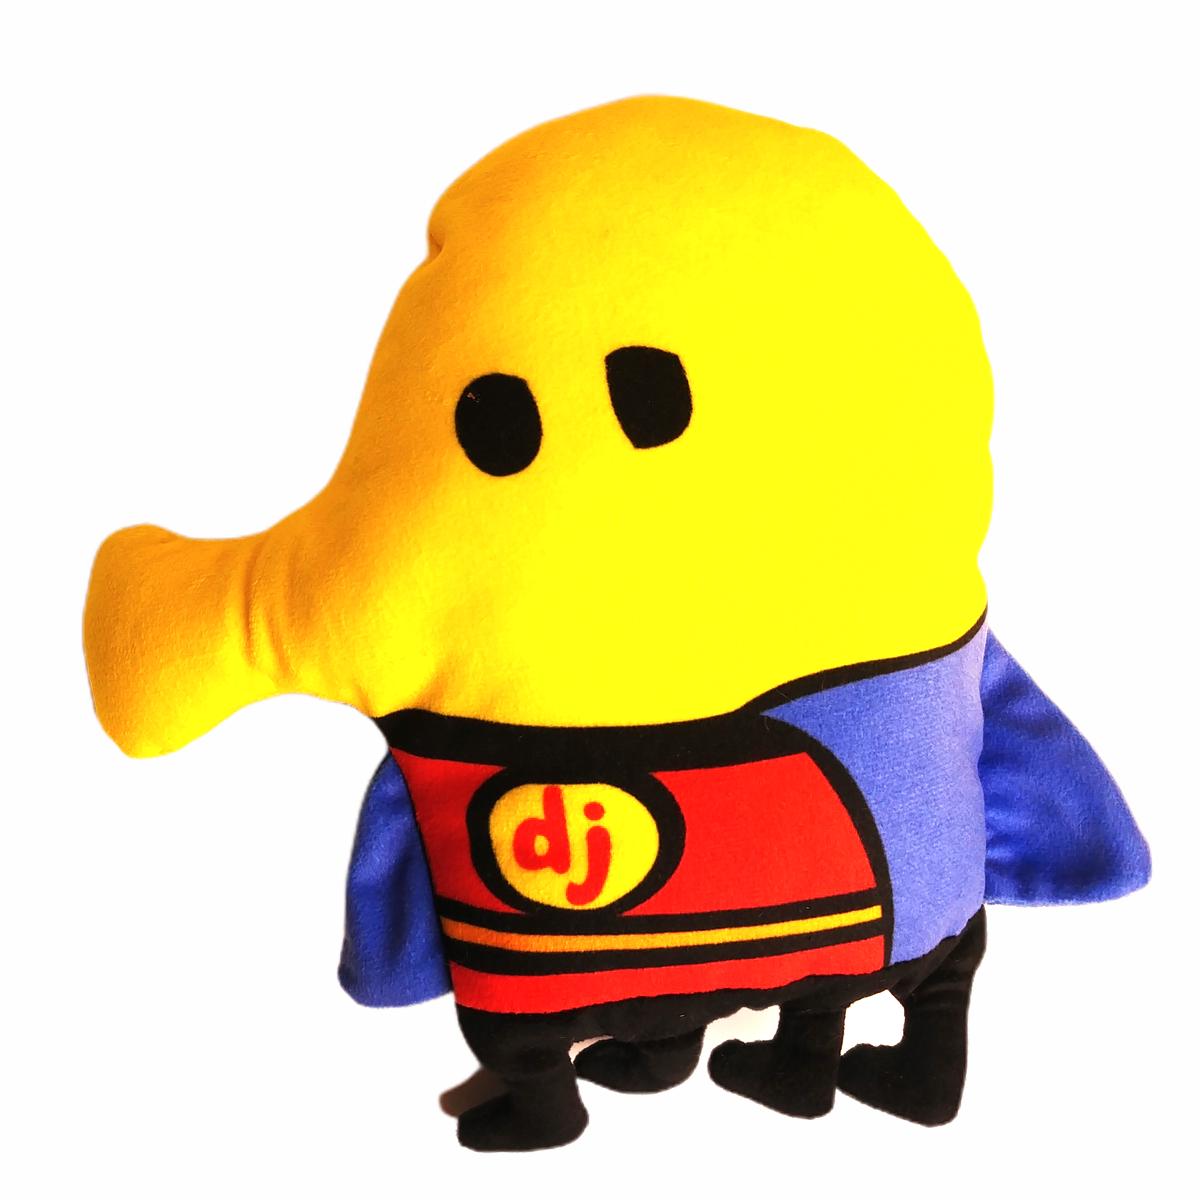 "Doodle Jumper Sega Toy Europe Claw Prize Machine Toy Superhero Cape 9"" Rare 2015 - $6.20"